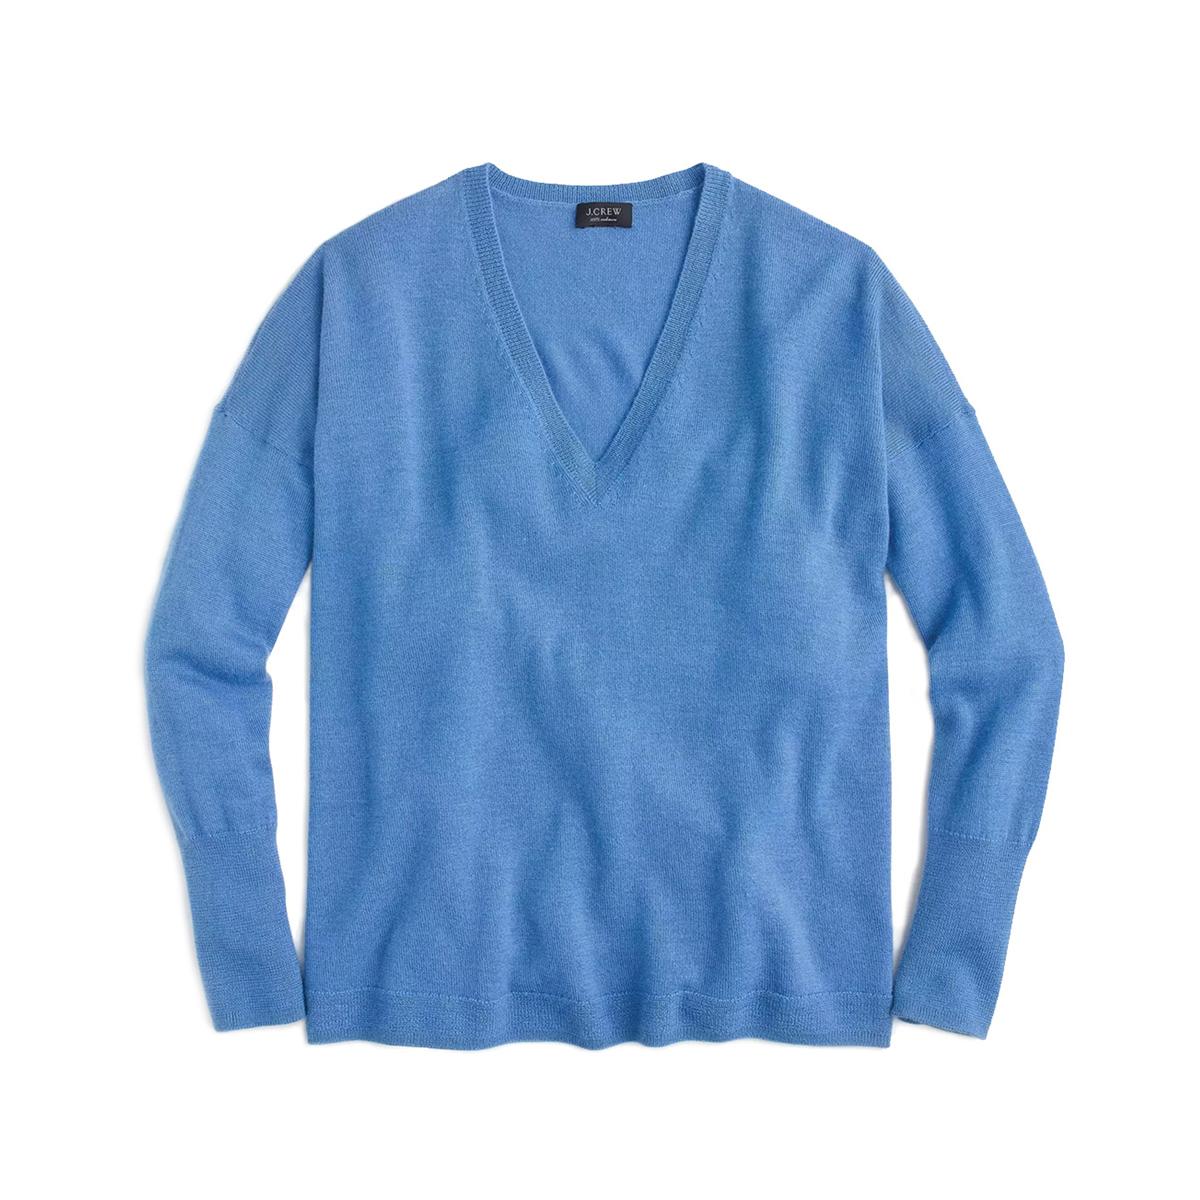 v neck cashmere blue.jpg